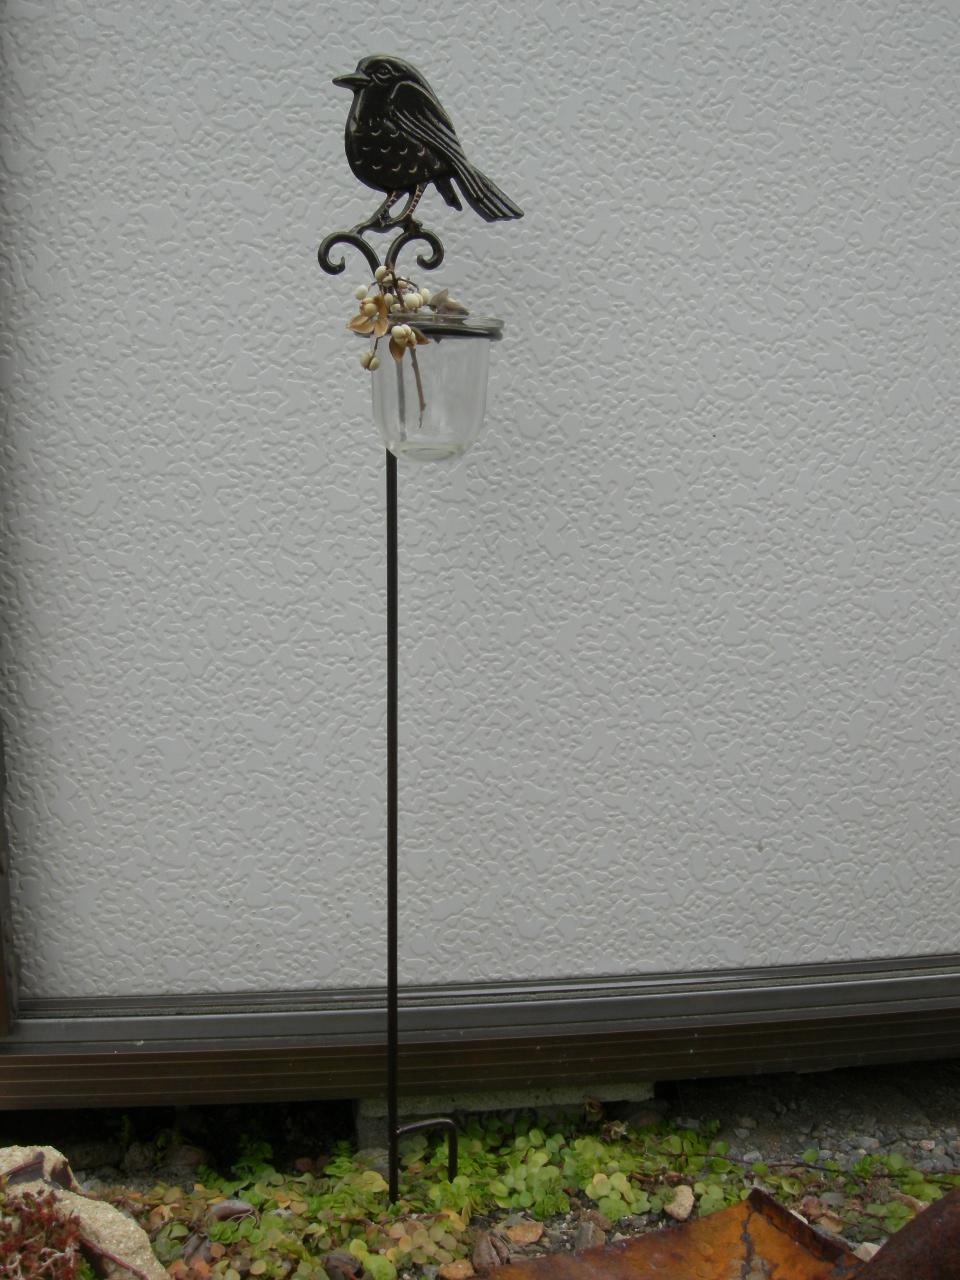 Bird ガラススティック H/690 D/110 W/85 ::3351【バッグ・小物・ブランド雑貨】記念日向けギフトの通販サイト「バースデープレス」